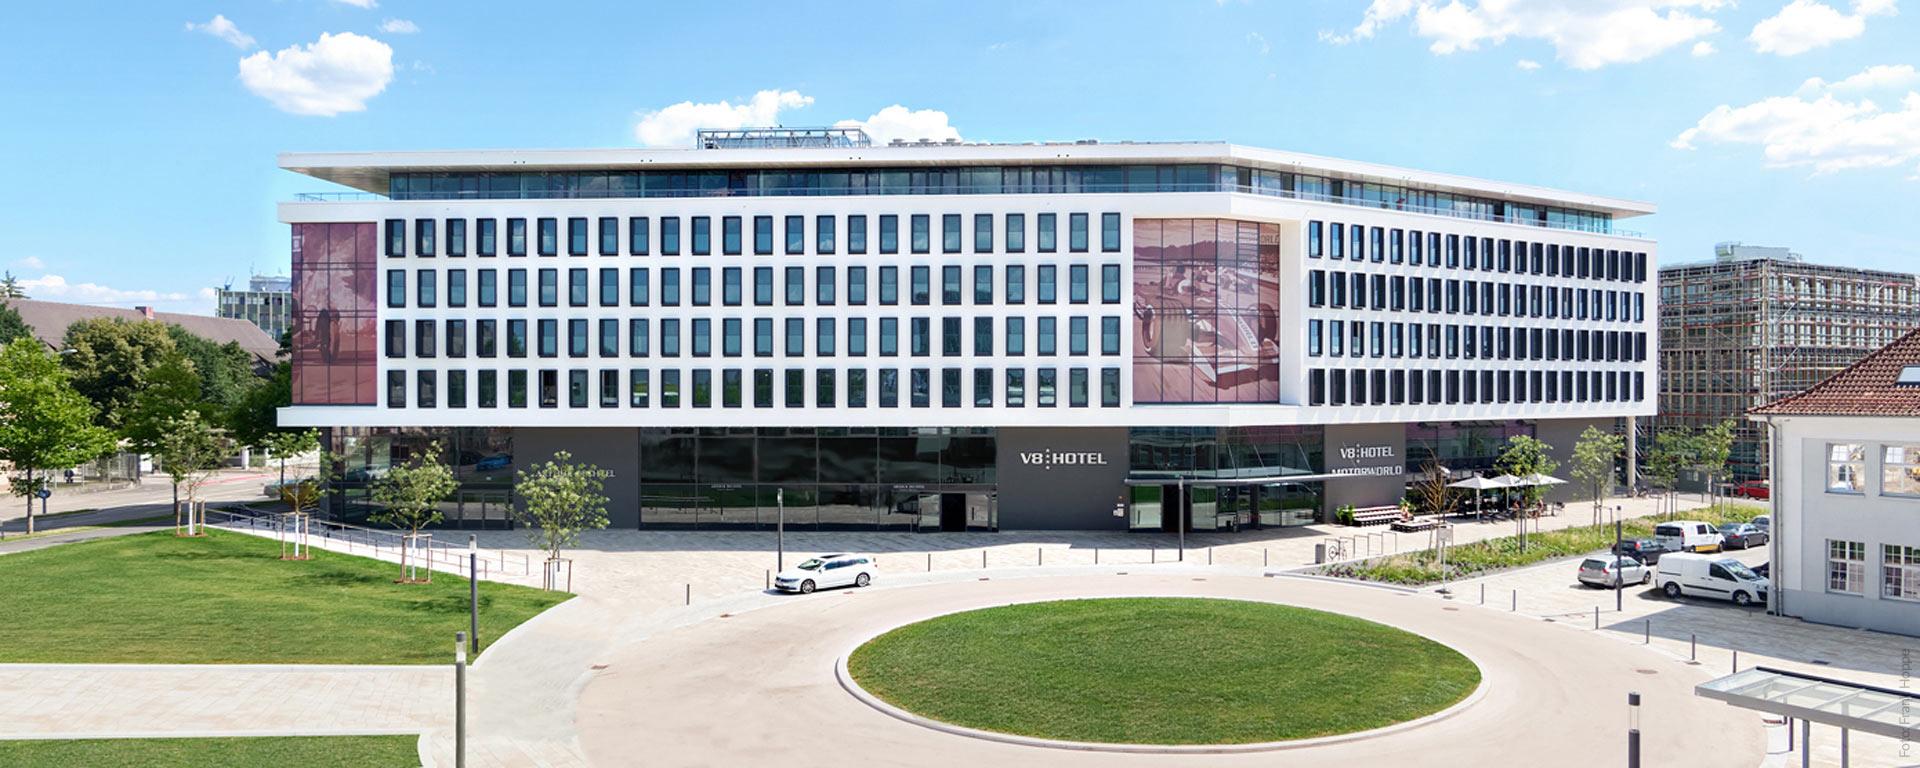 V8 HOTEL & V8 HOTEL CLASSIC MOTORWORLD REGION STUTTGART: Das Automobile Themenhotel / Designhotel  in Böblingen (BB) Flugfeld